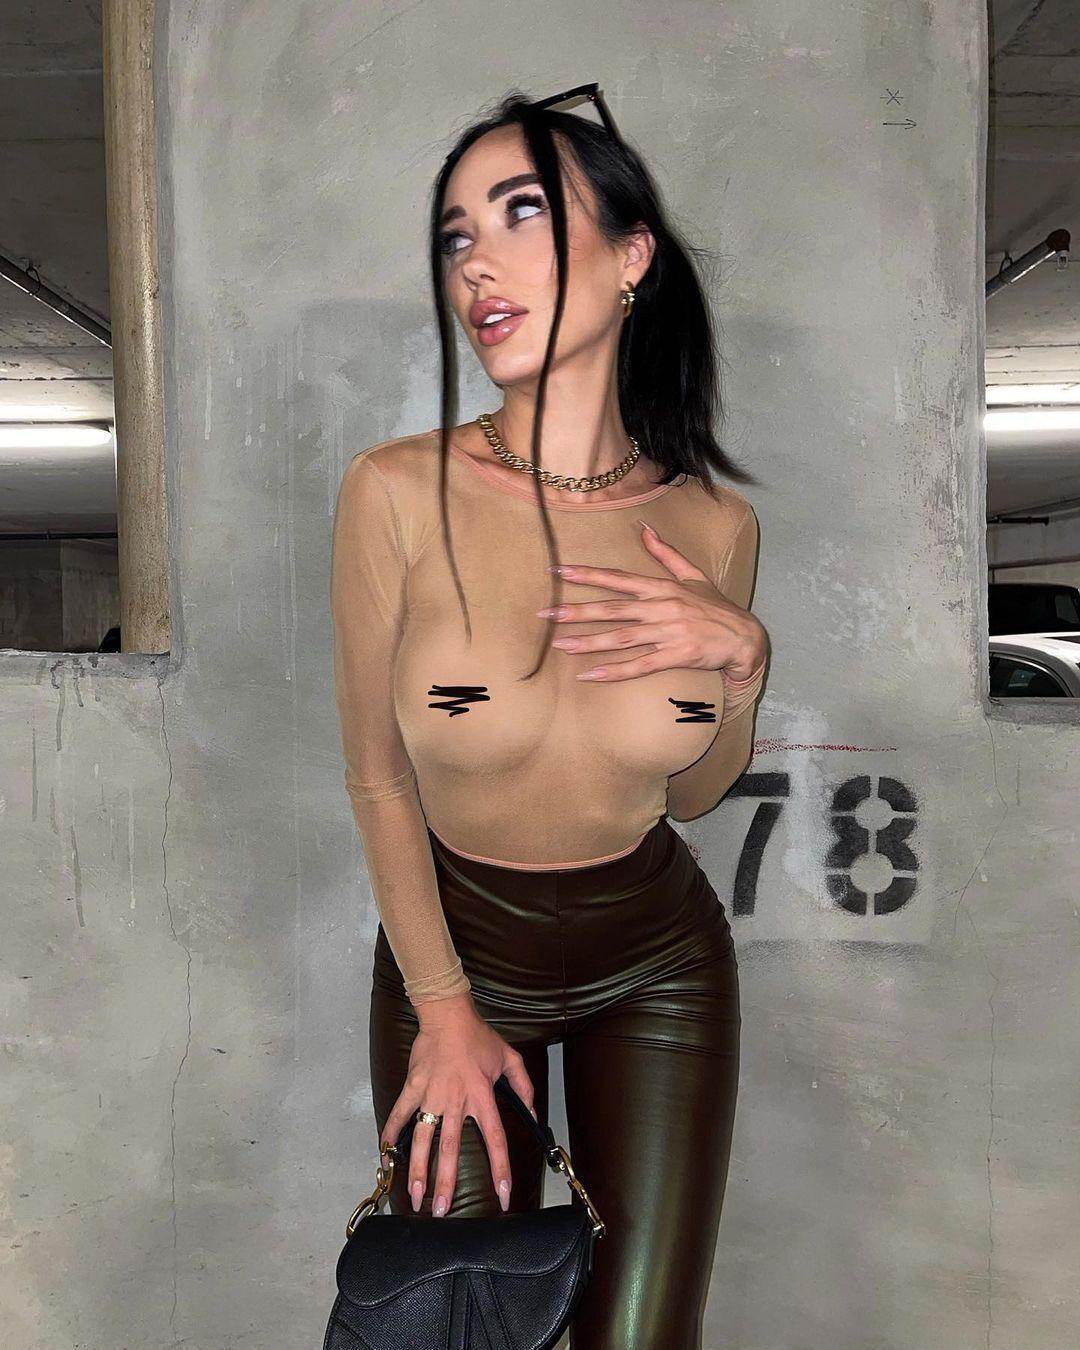 Нина Сереброва в прозрачной кофте